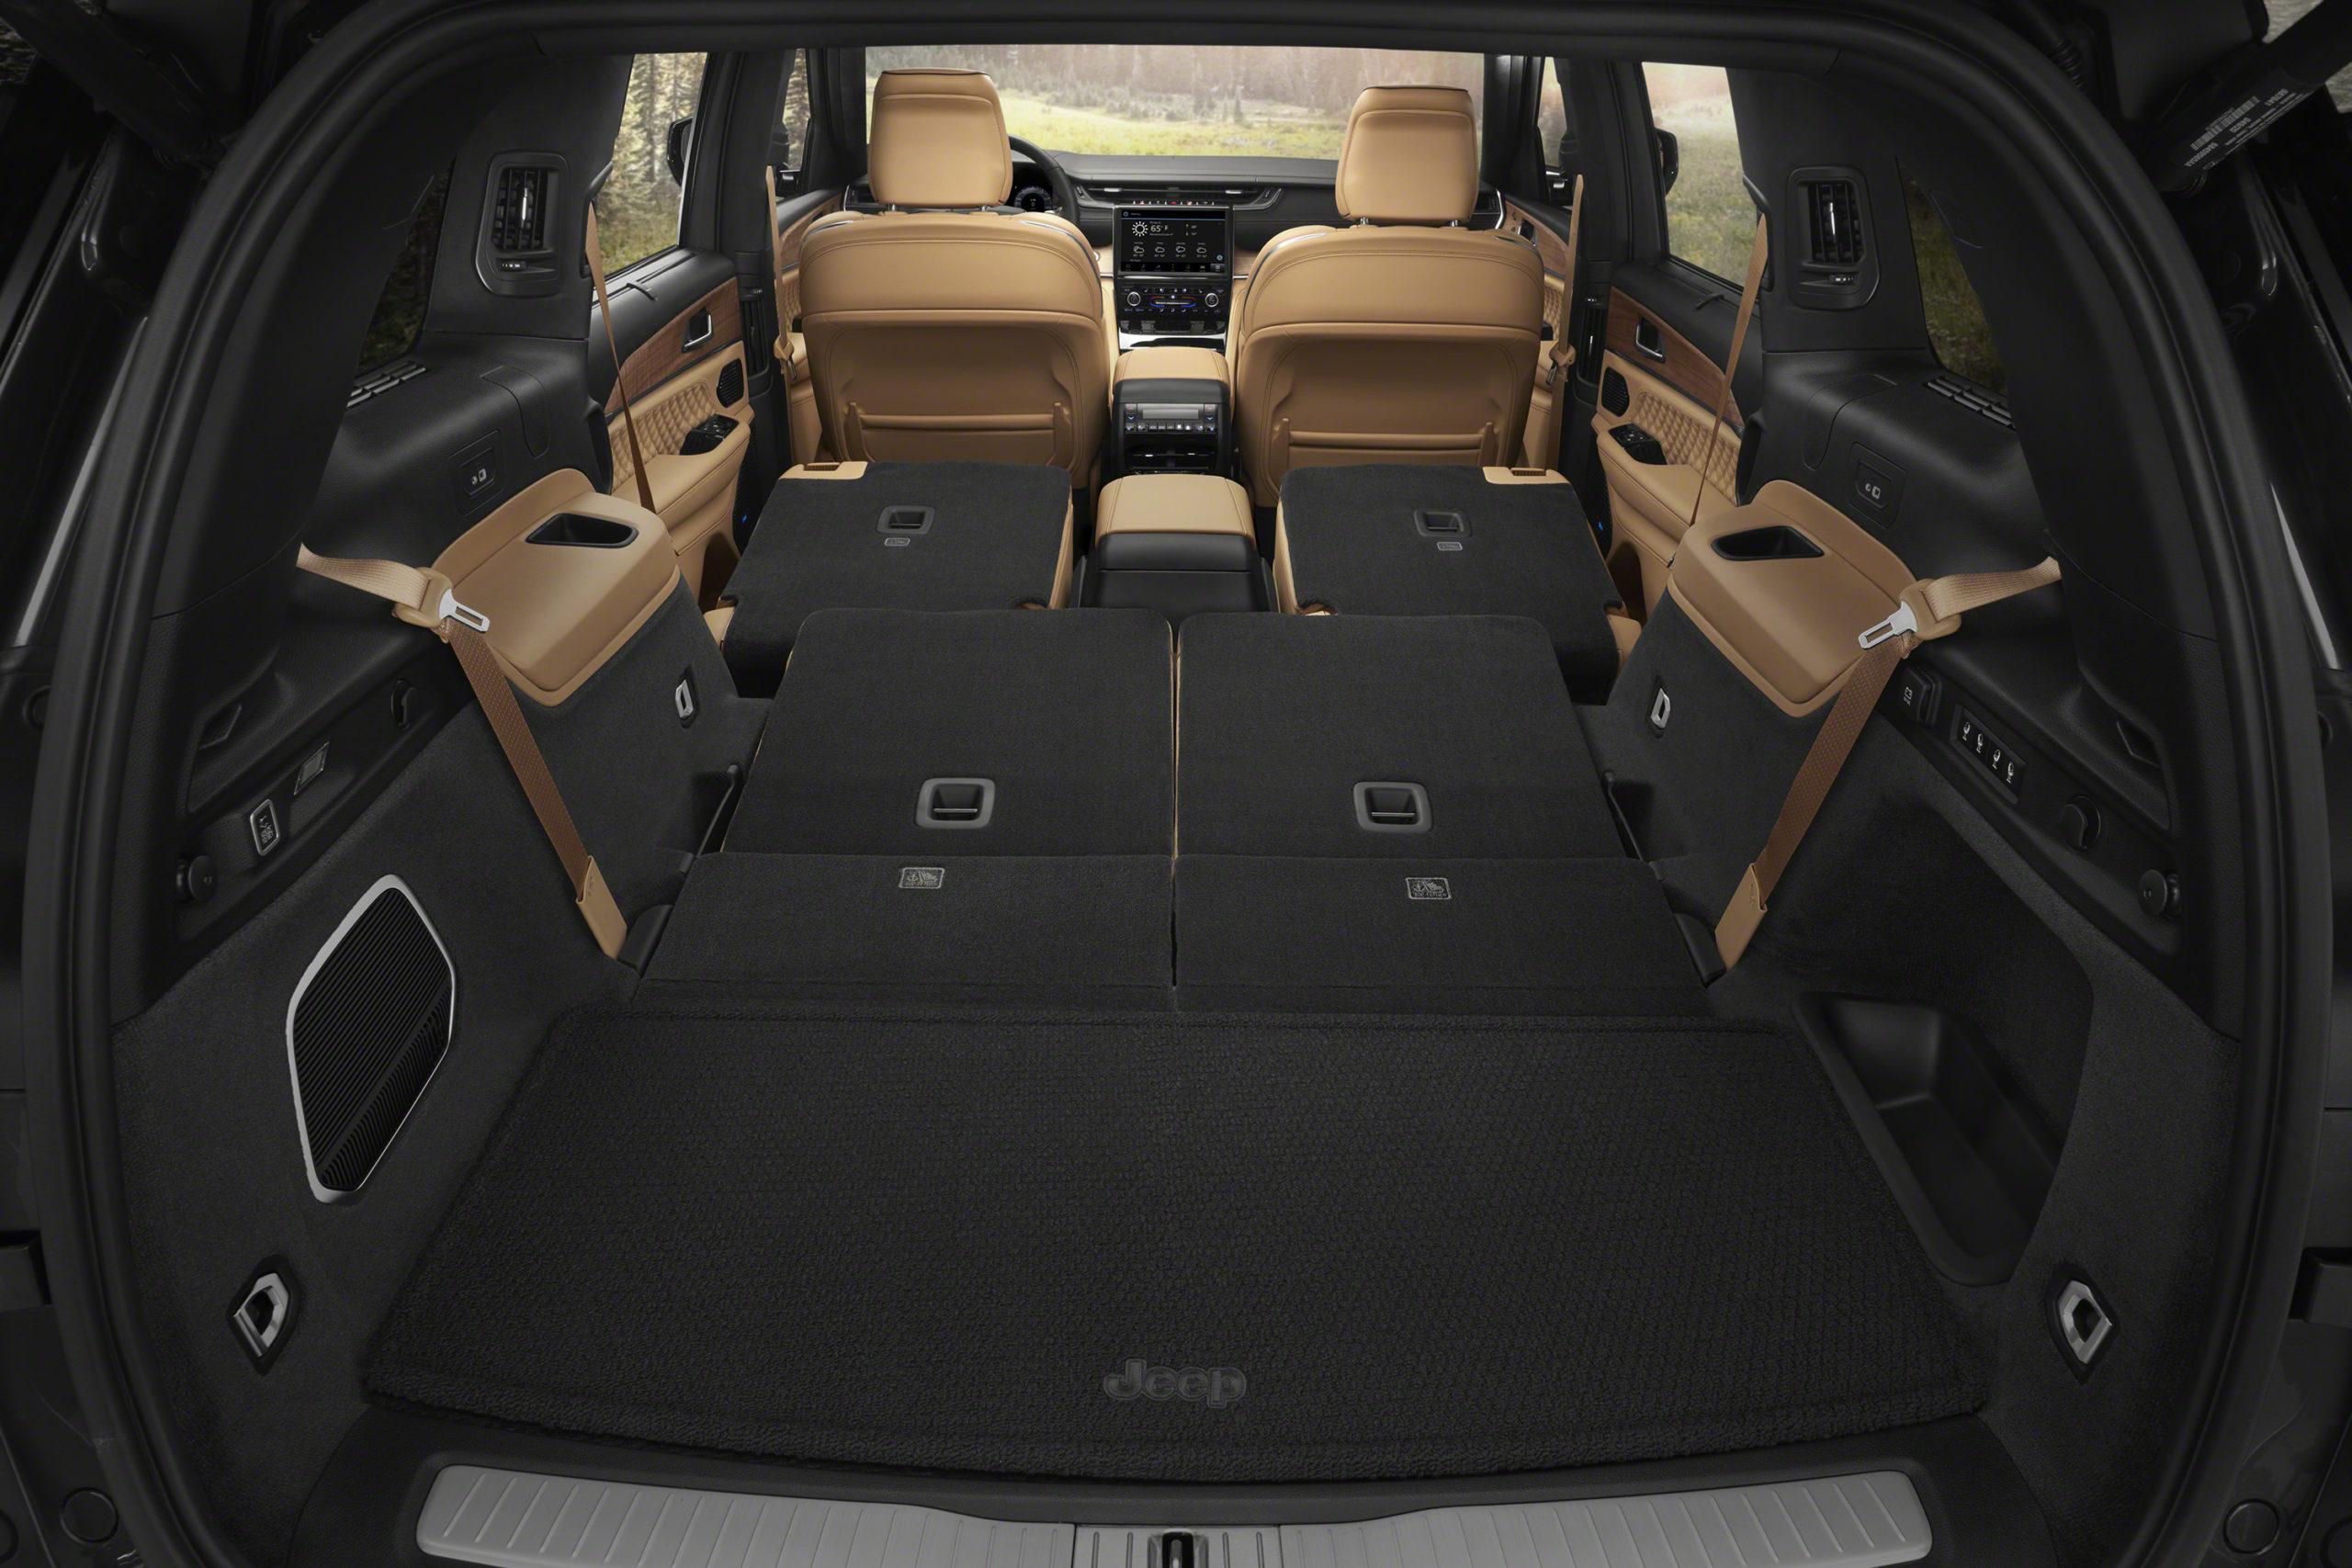 2021 Jeep Grand Cherokee L Summit Reserve rear interior cargo space